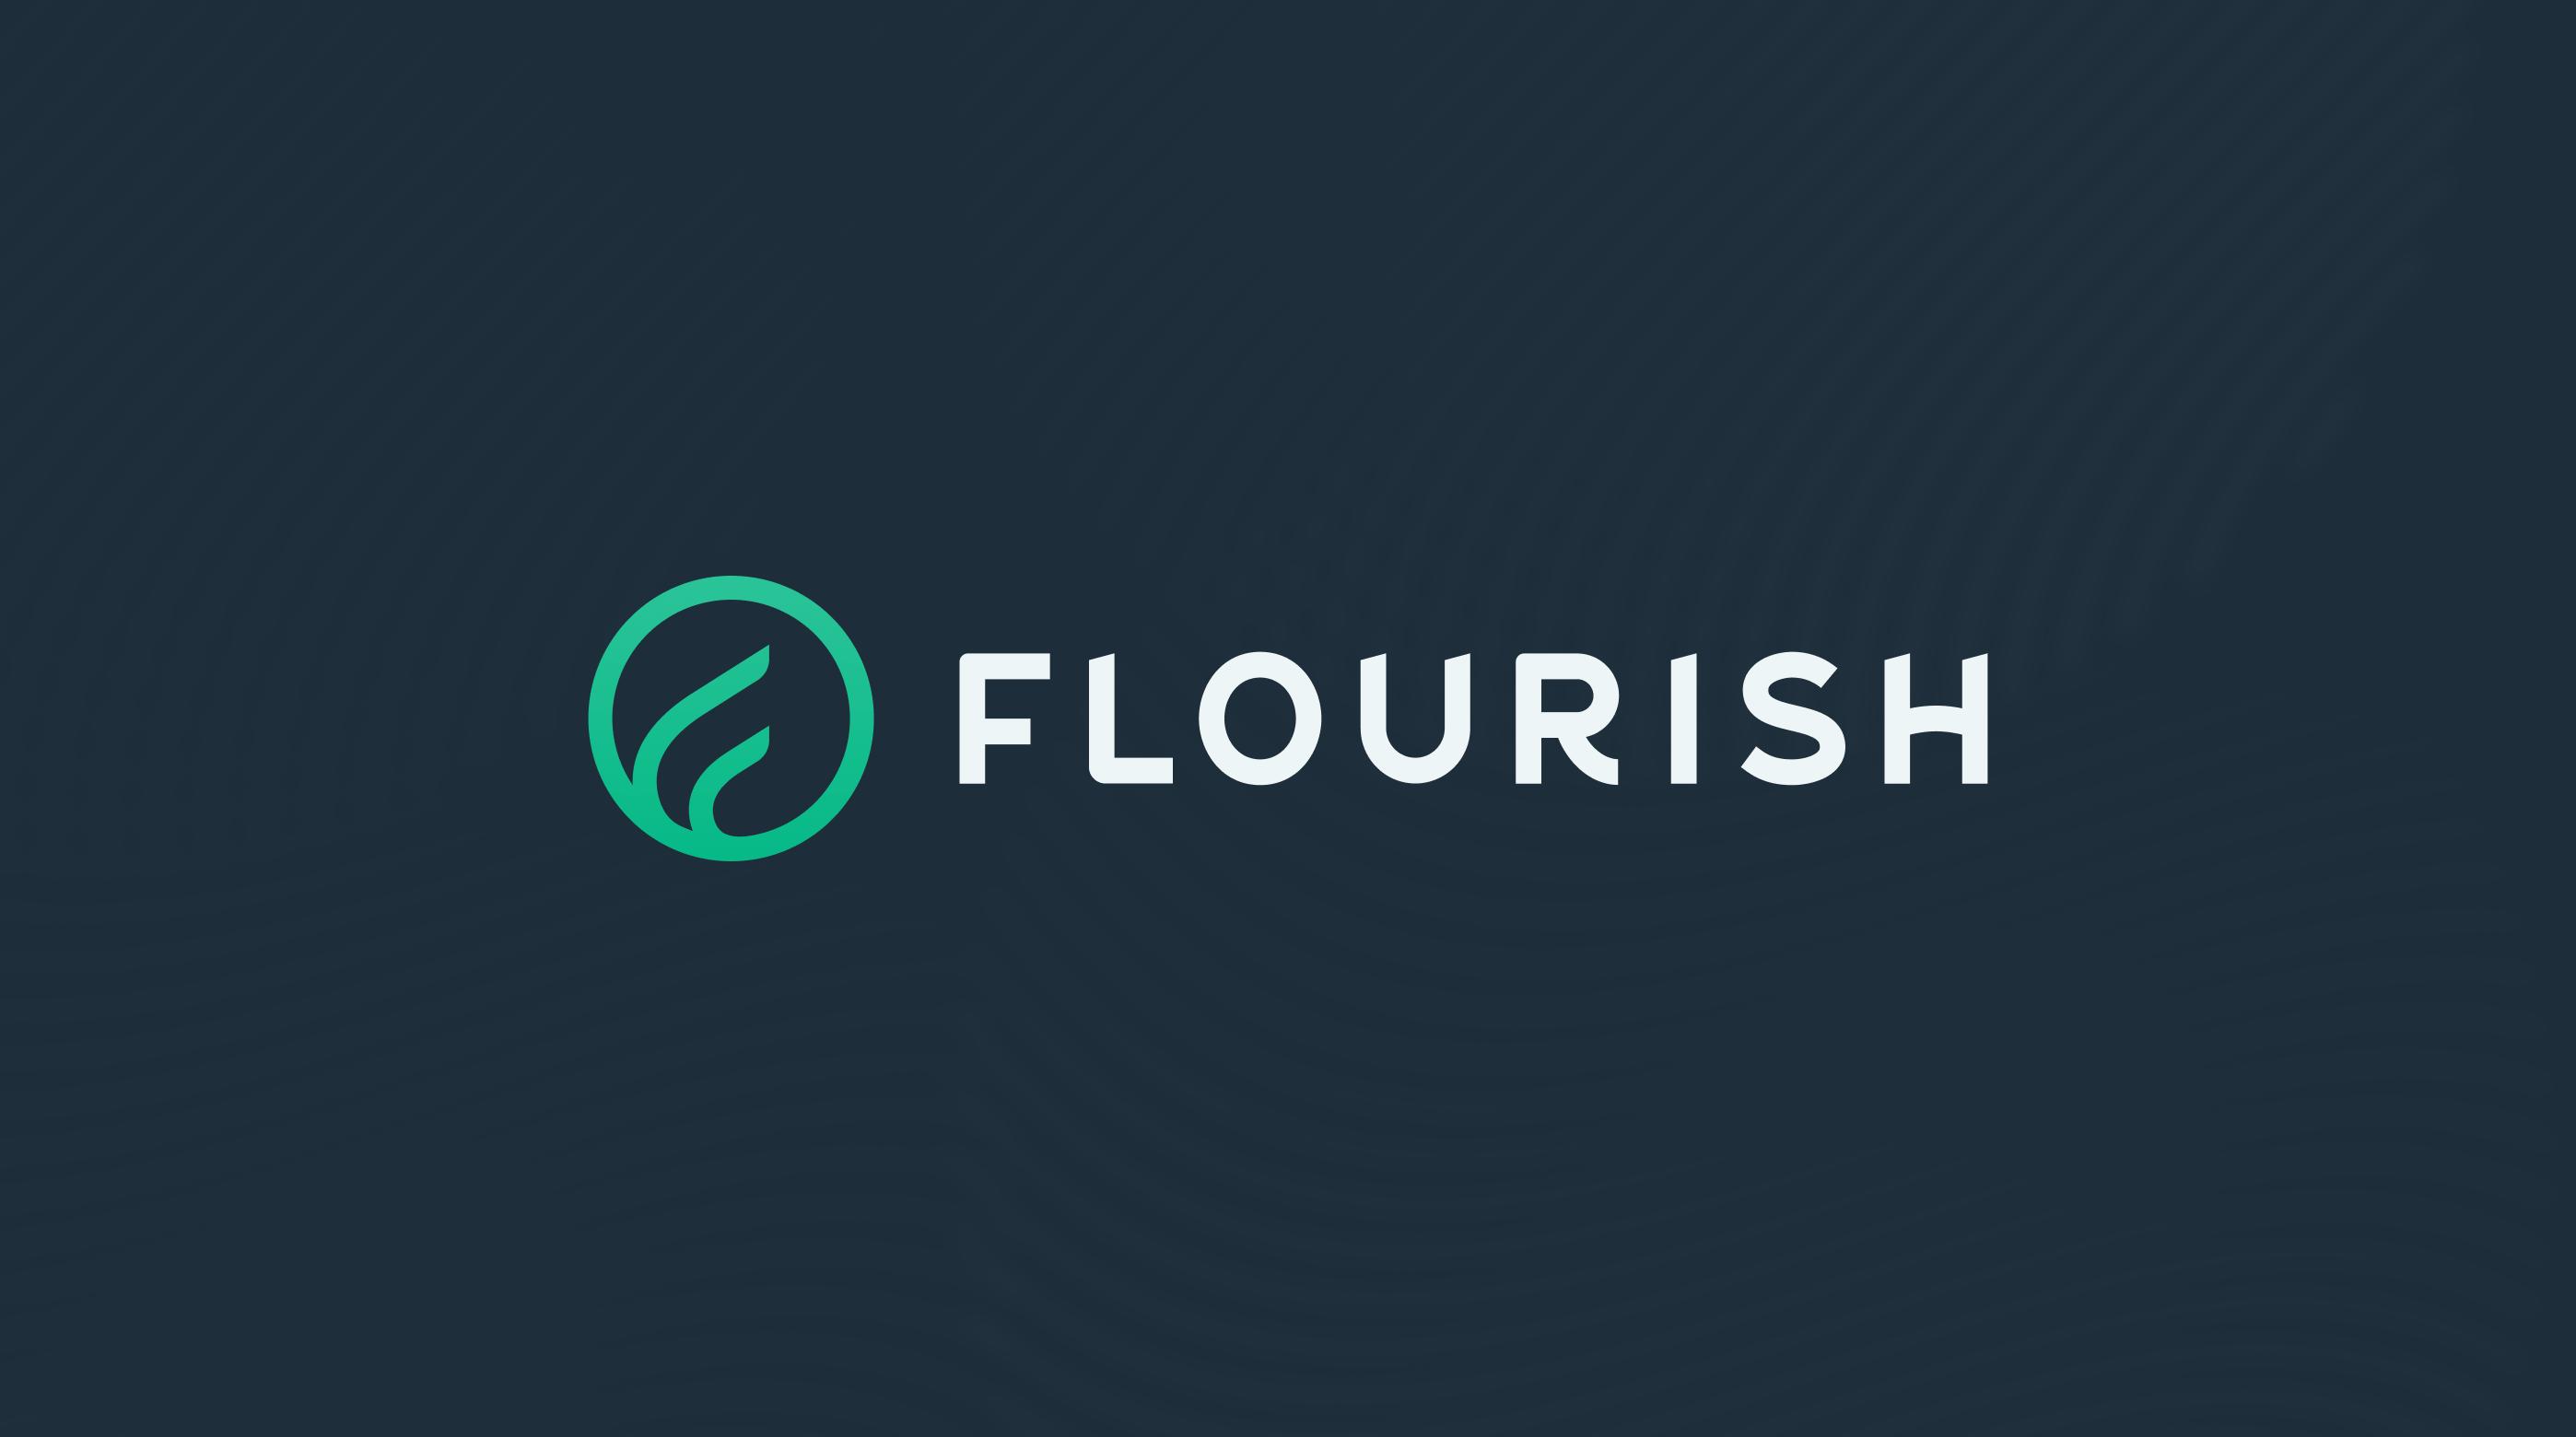 Flourish logo header.